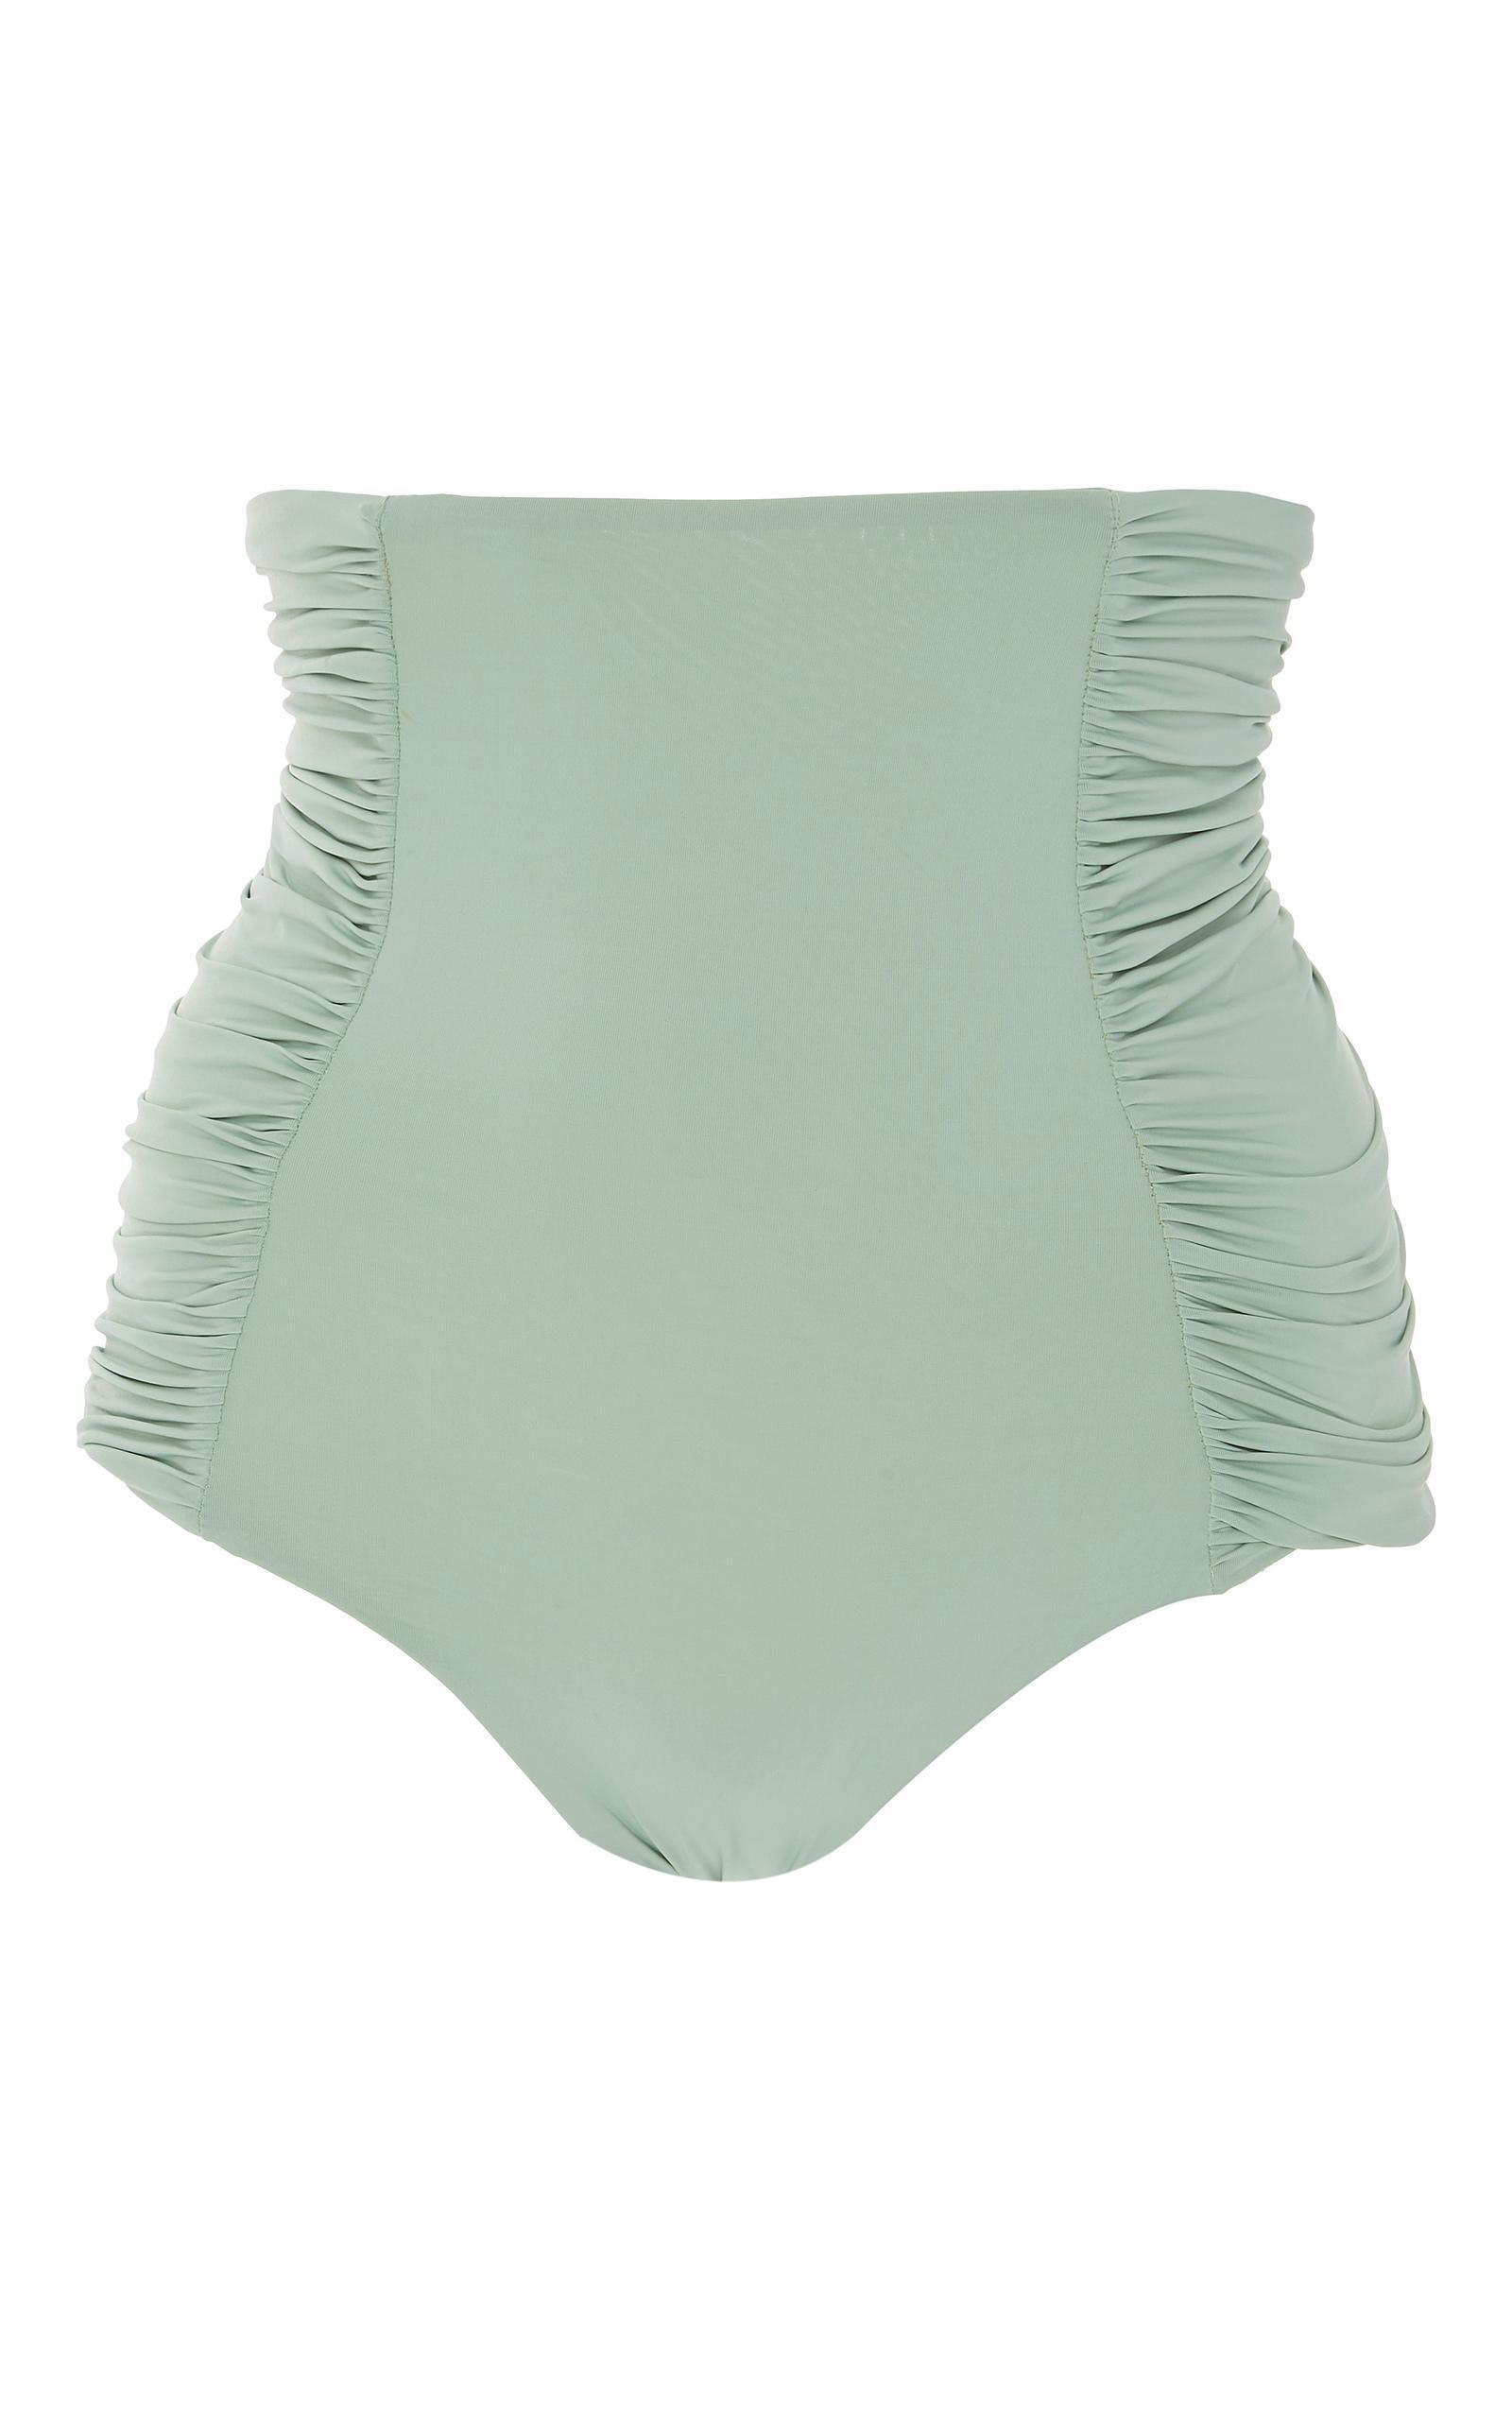 Johanna Ortiz M'o Exclusive Shelly High Rise Bikini Bottom In Green